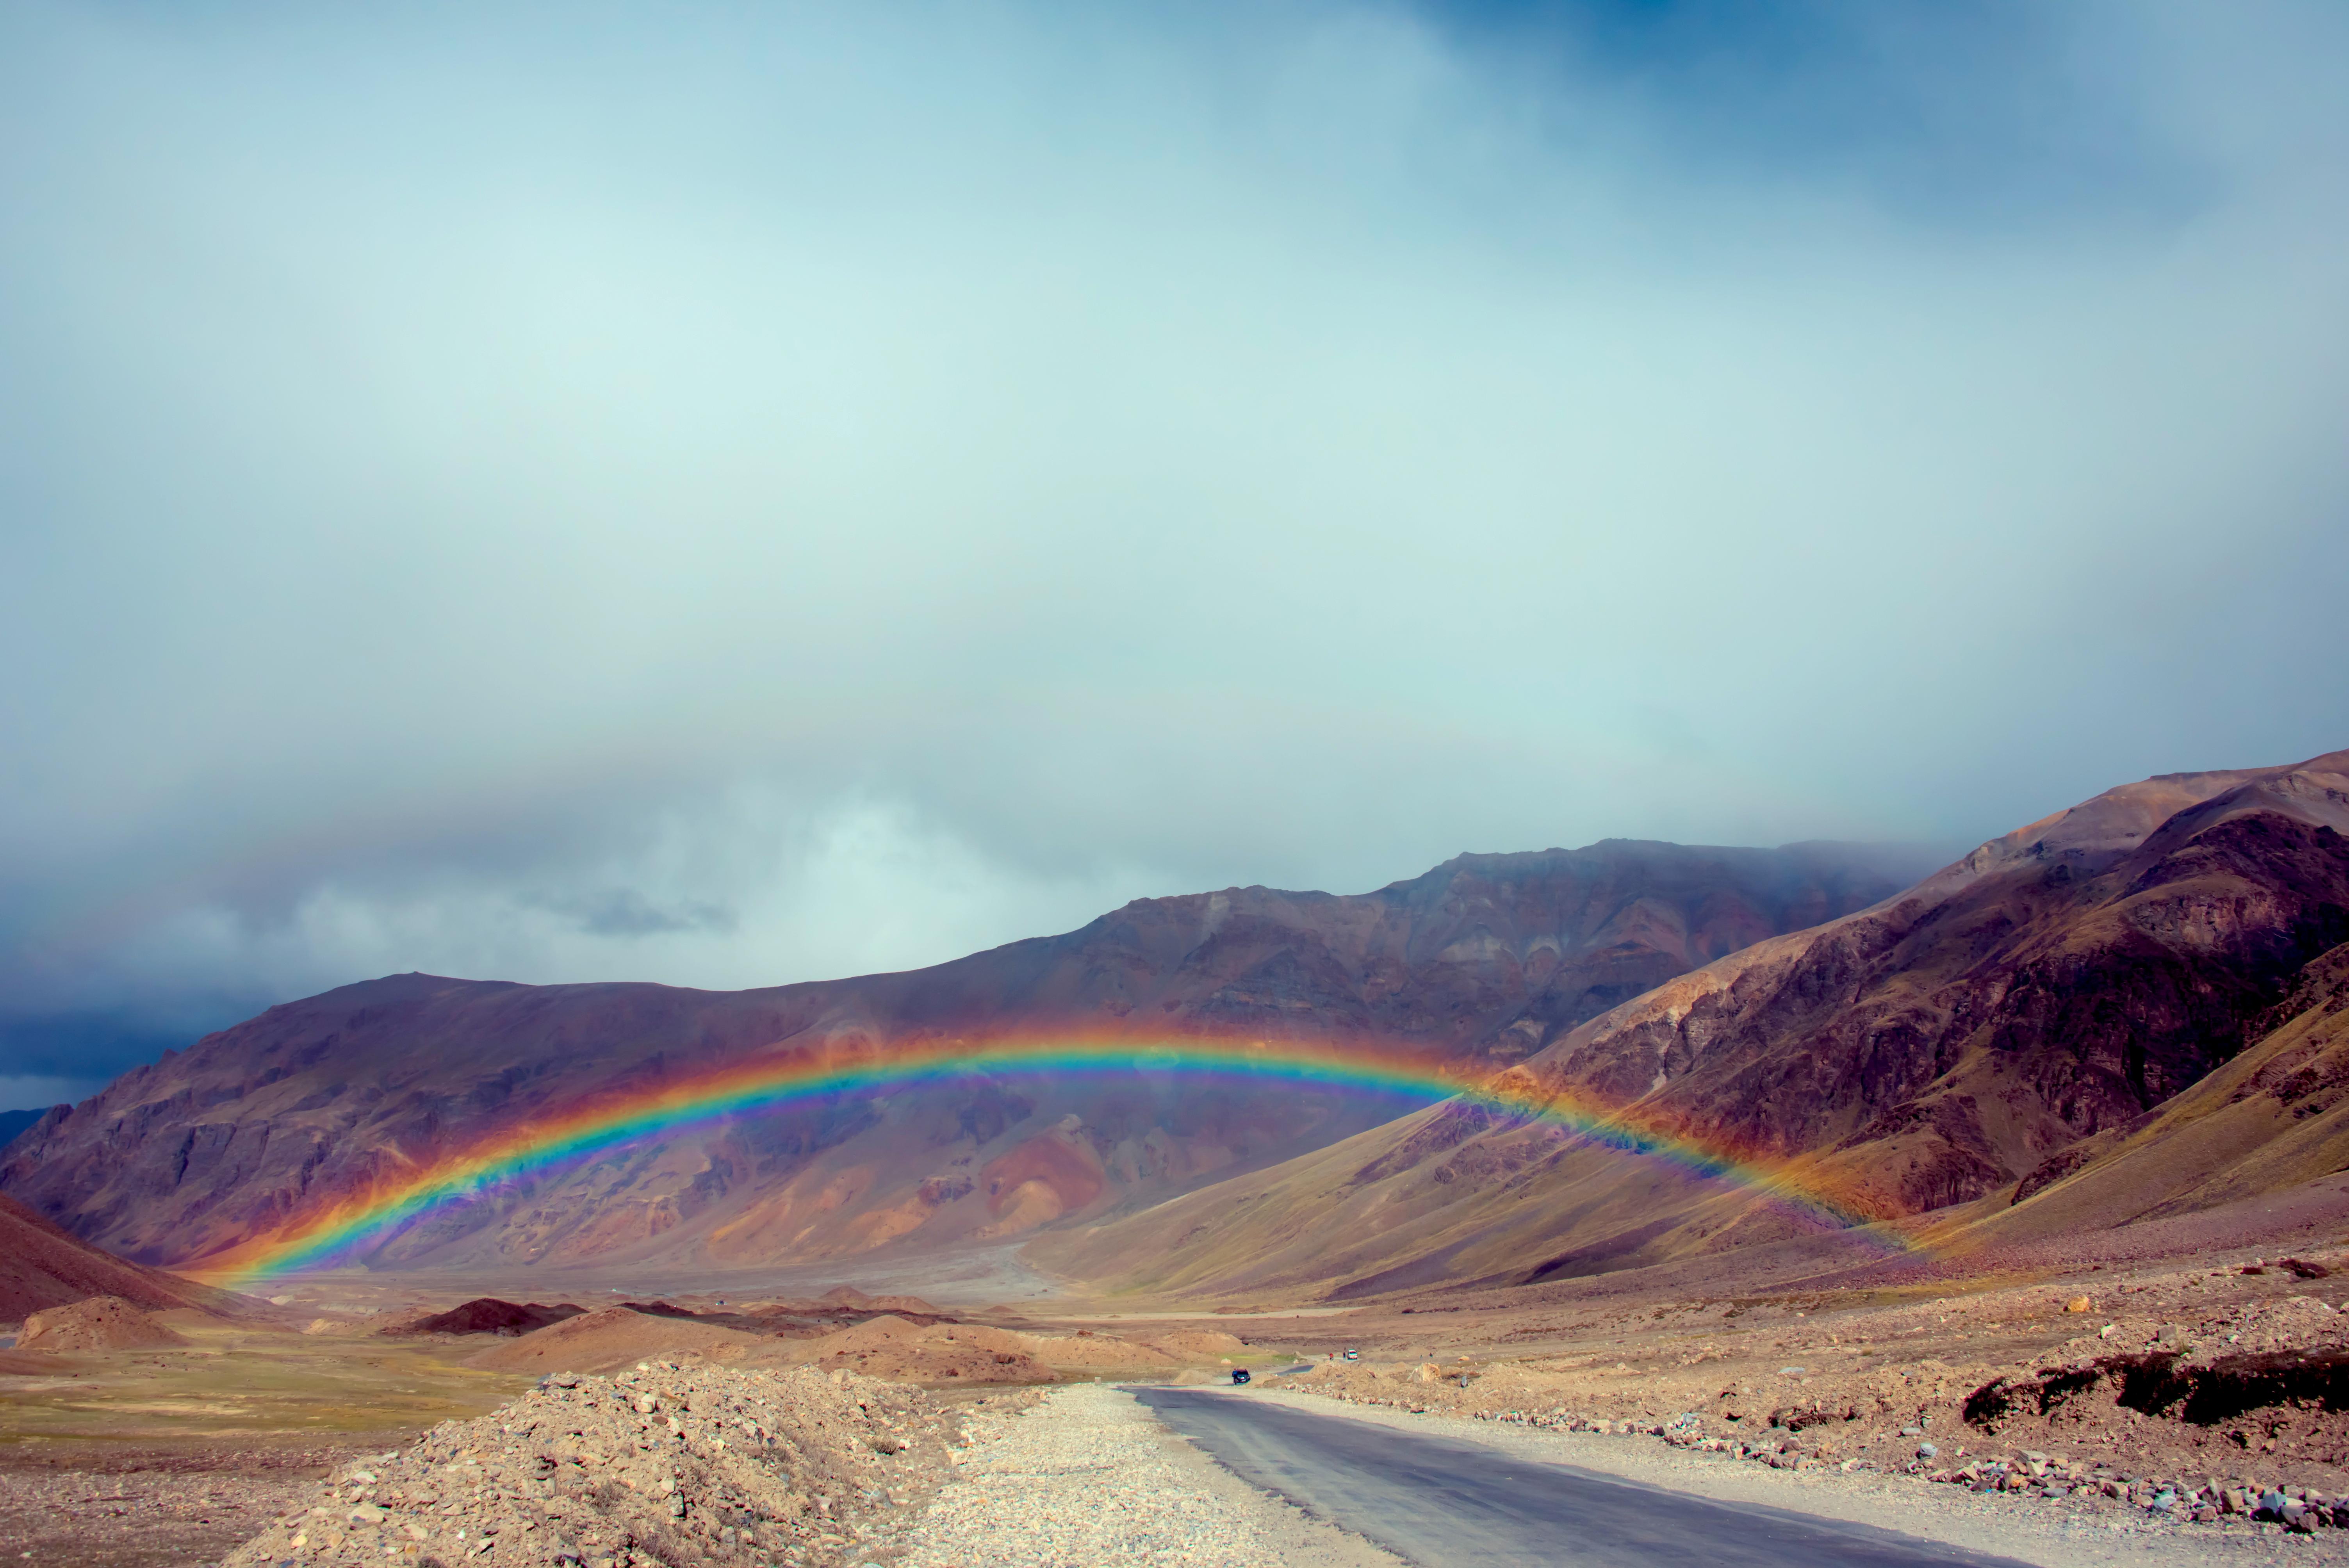 Rainbow Entrance To Spiritual Himalayas